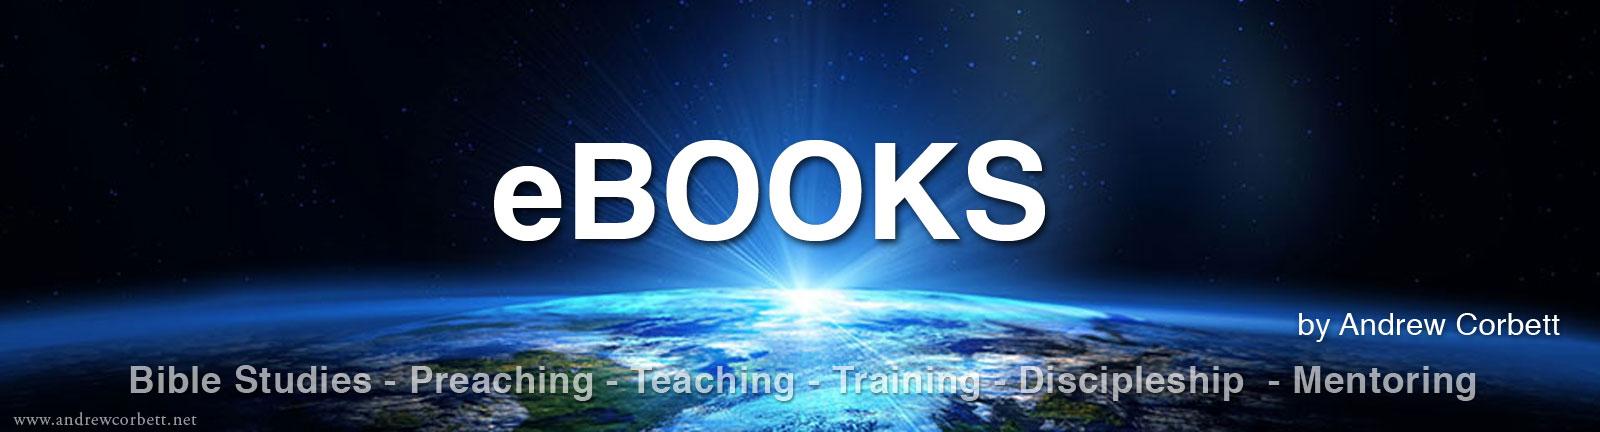 eBooks by Dr. Andrew Corbett